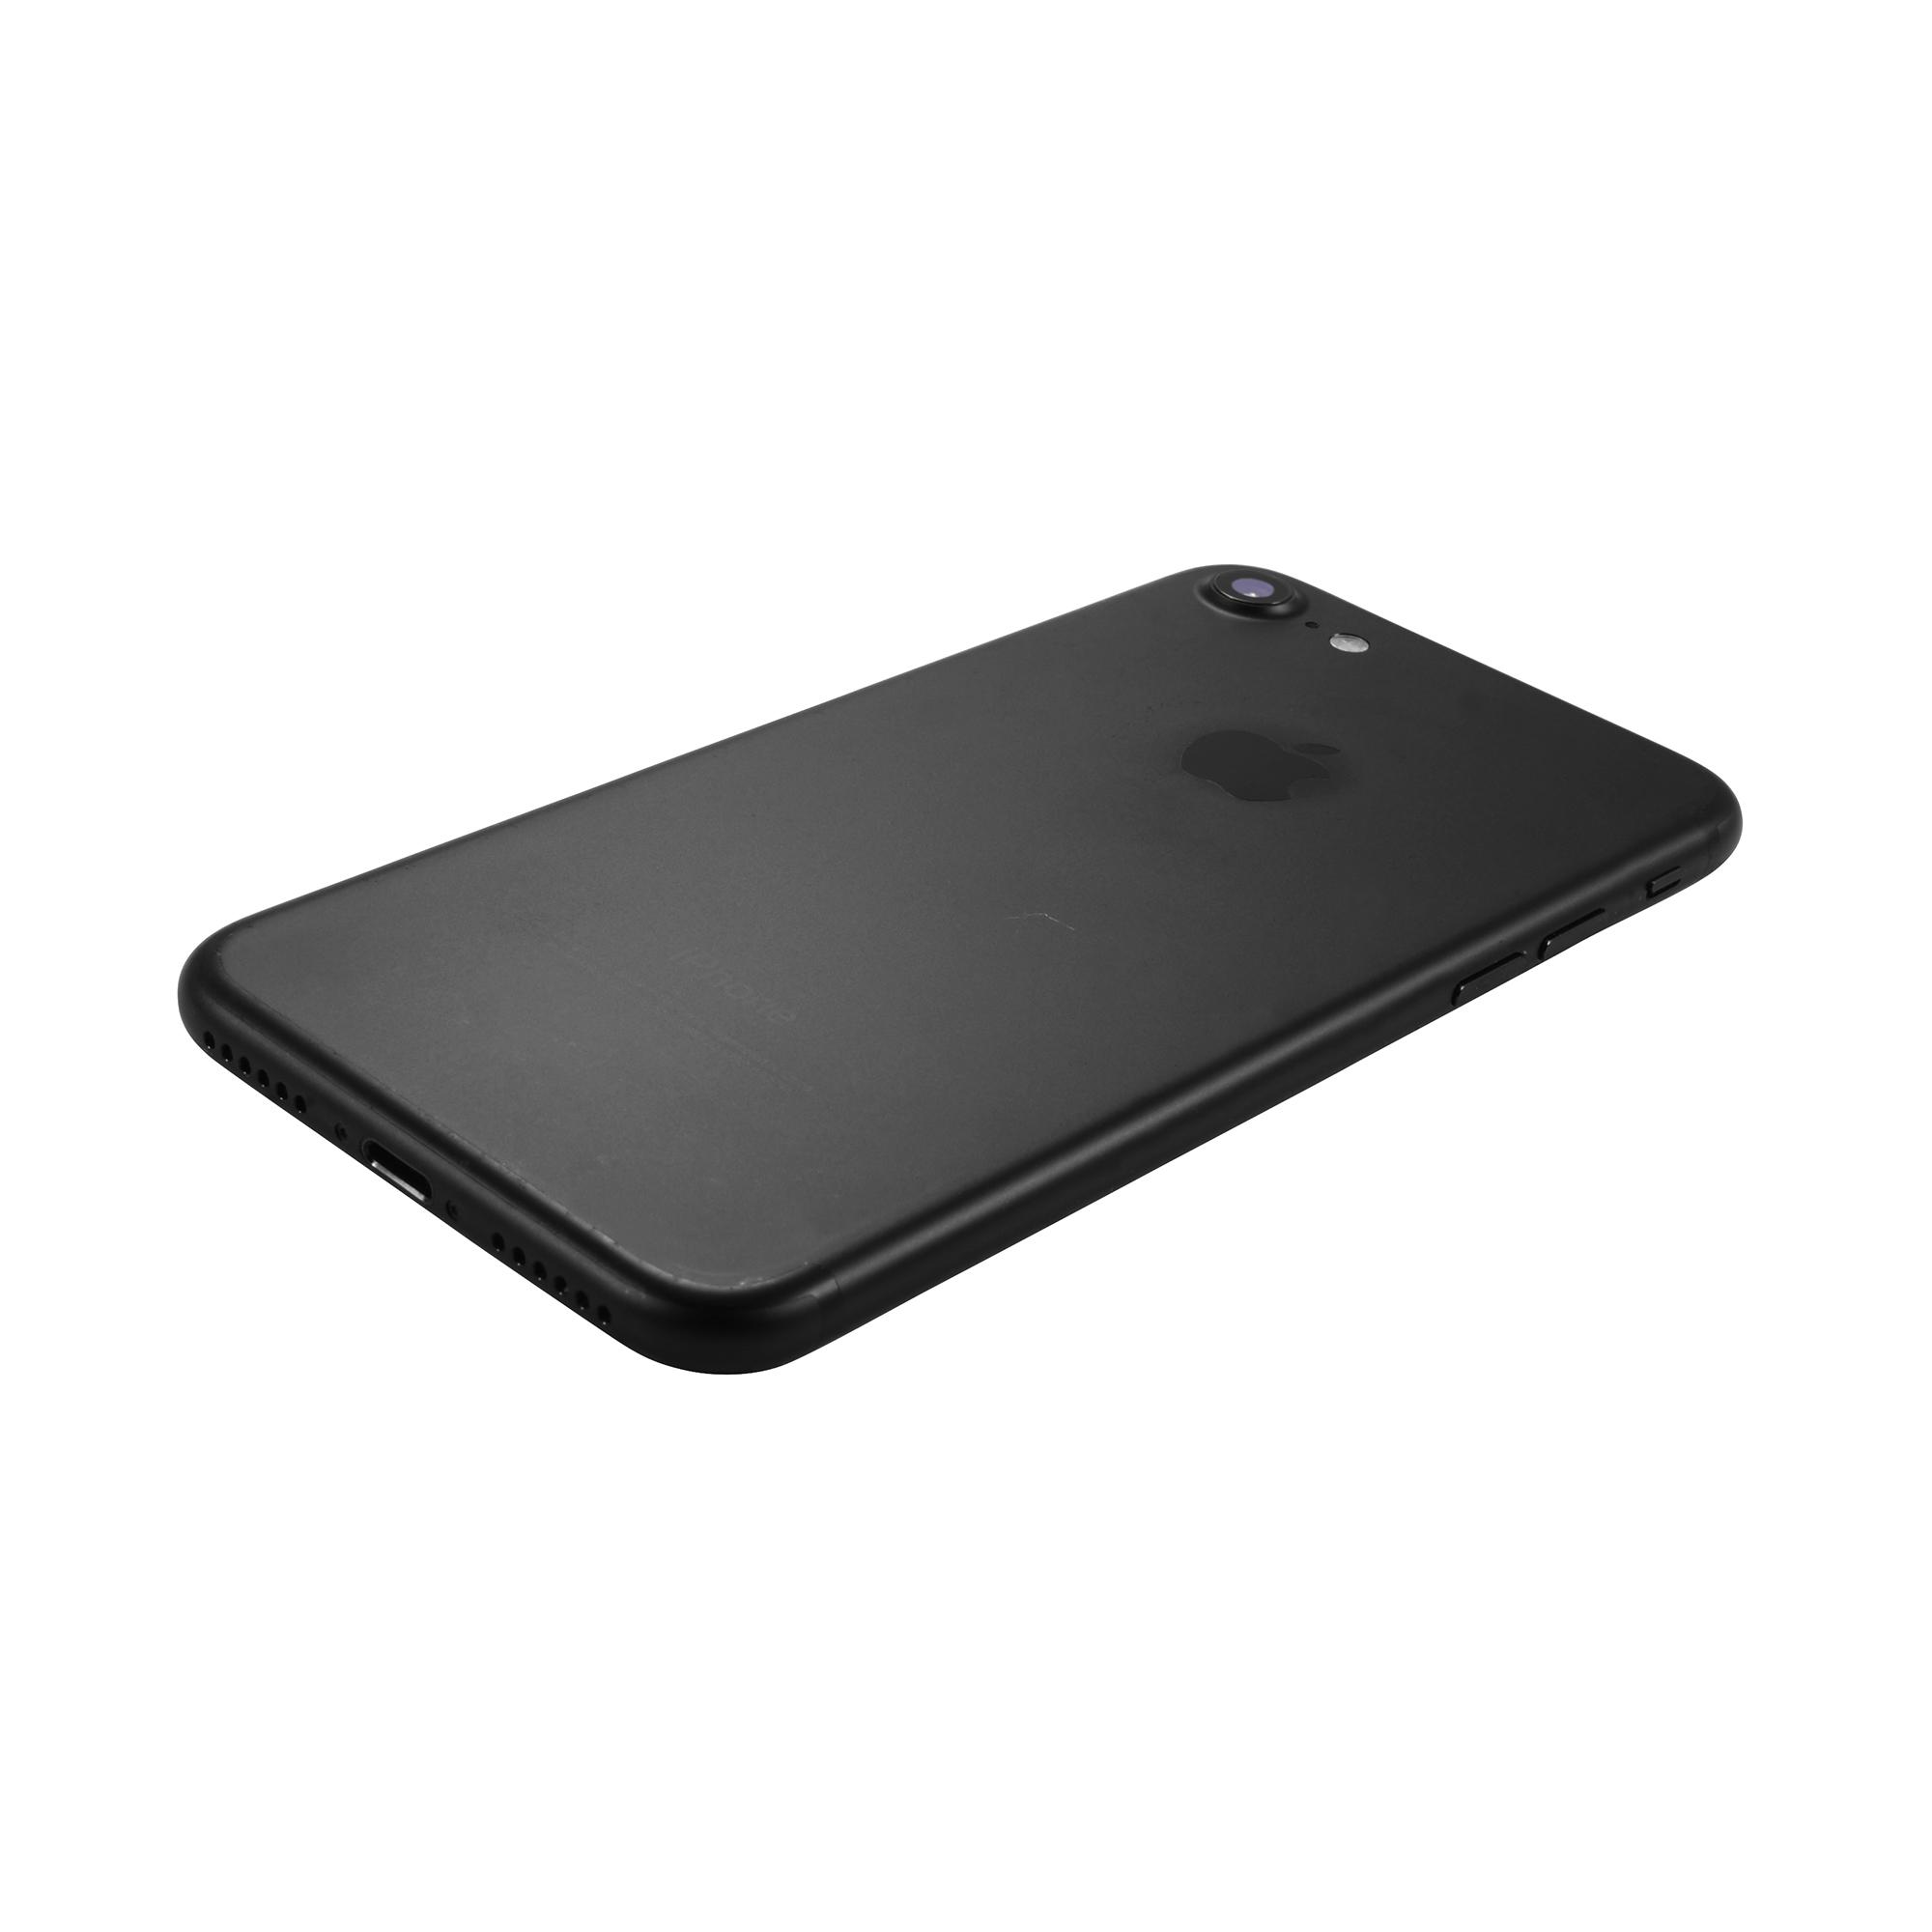 Apple iPhone 7 a1660 32GB CDMA/GSM Unlocked - Fair Condition